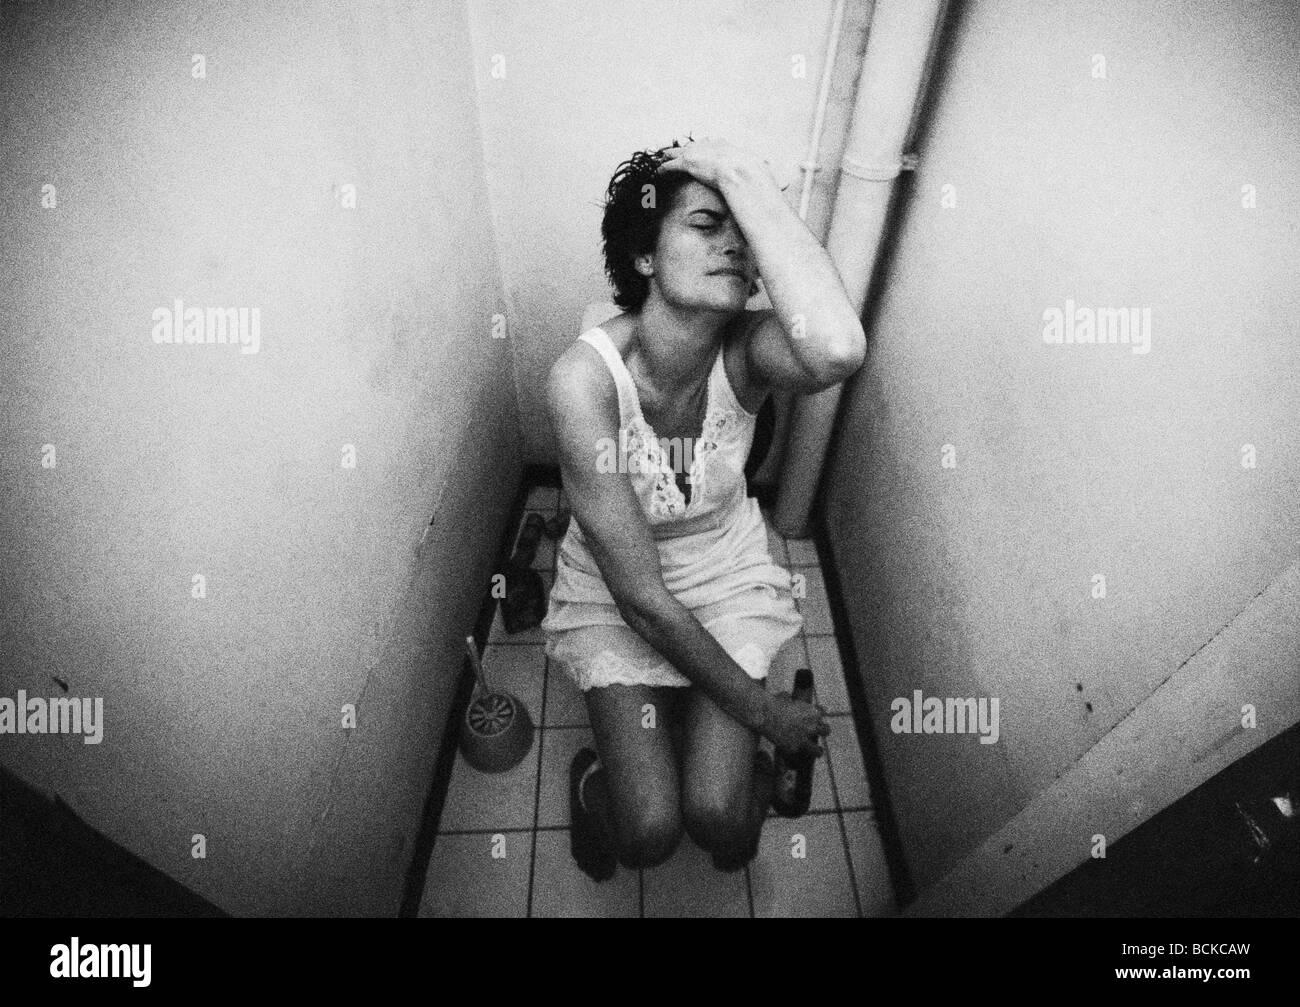 Woman sitting on toilet holding bottle, b&w - Stock Image